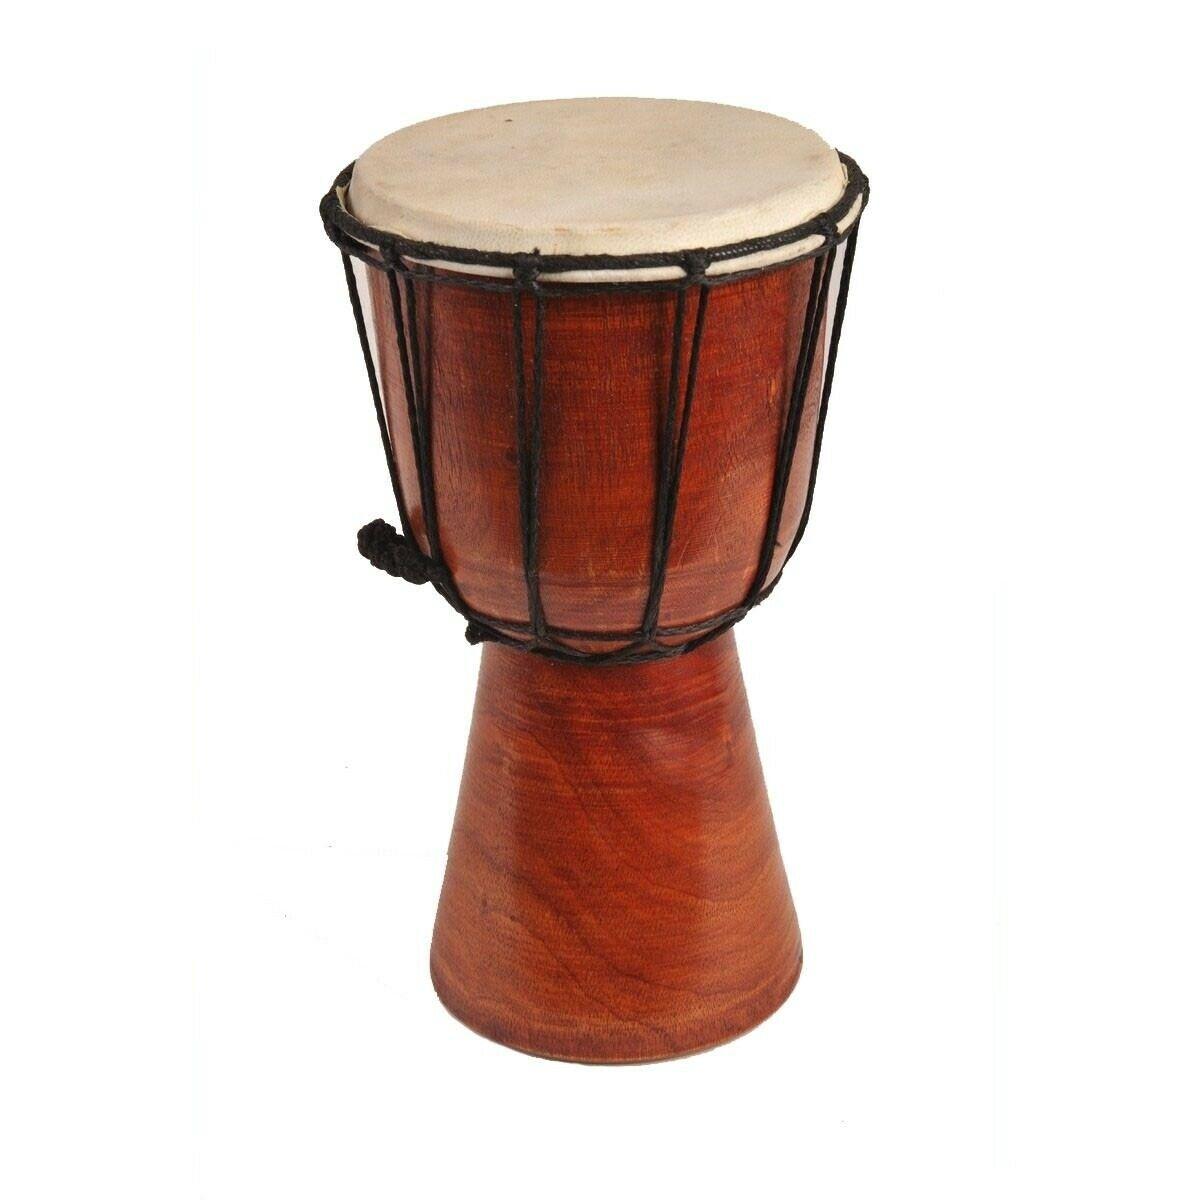 trumm (2329)